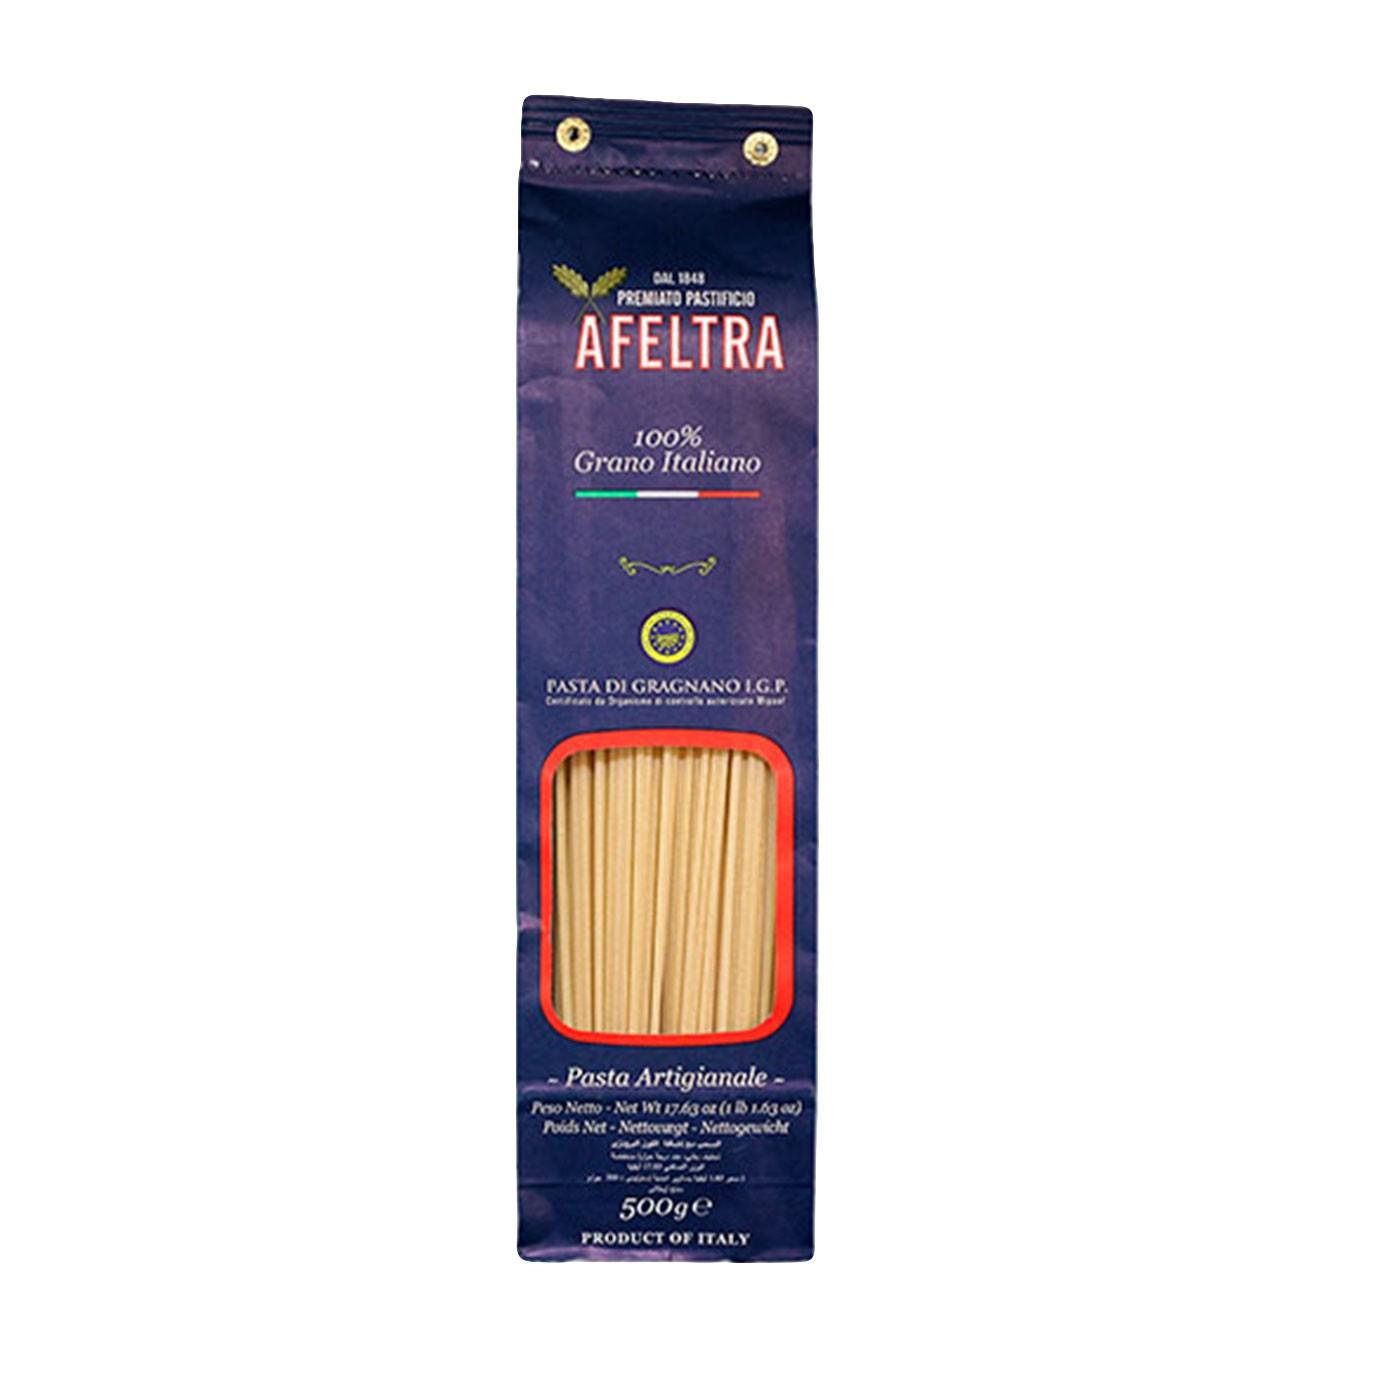 100% Italian Grain Spaghettone 17.6 oz - Afeltra